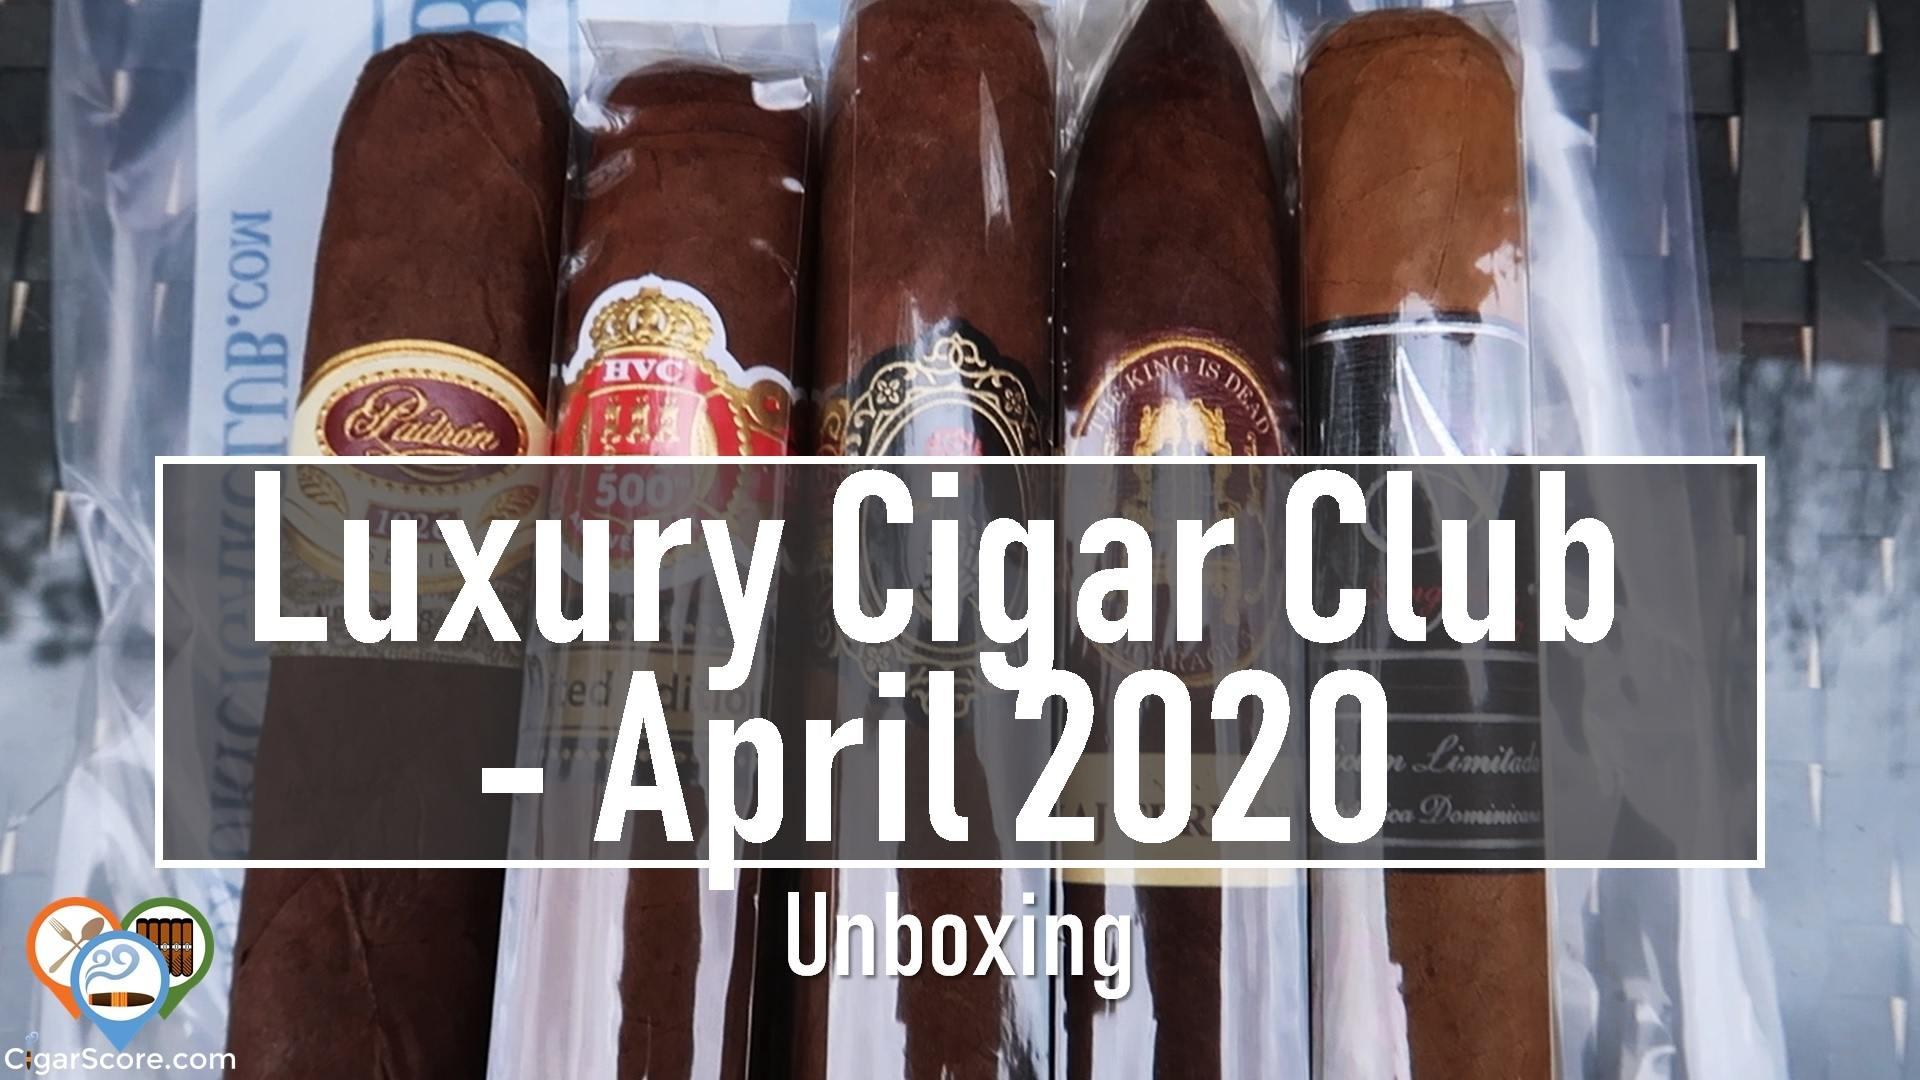 UNBOXING - Luxury Cigar Club APRIL 2020 - Est. $68.33 Value?